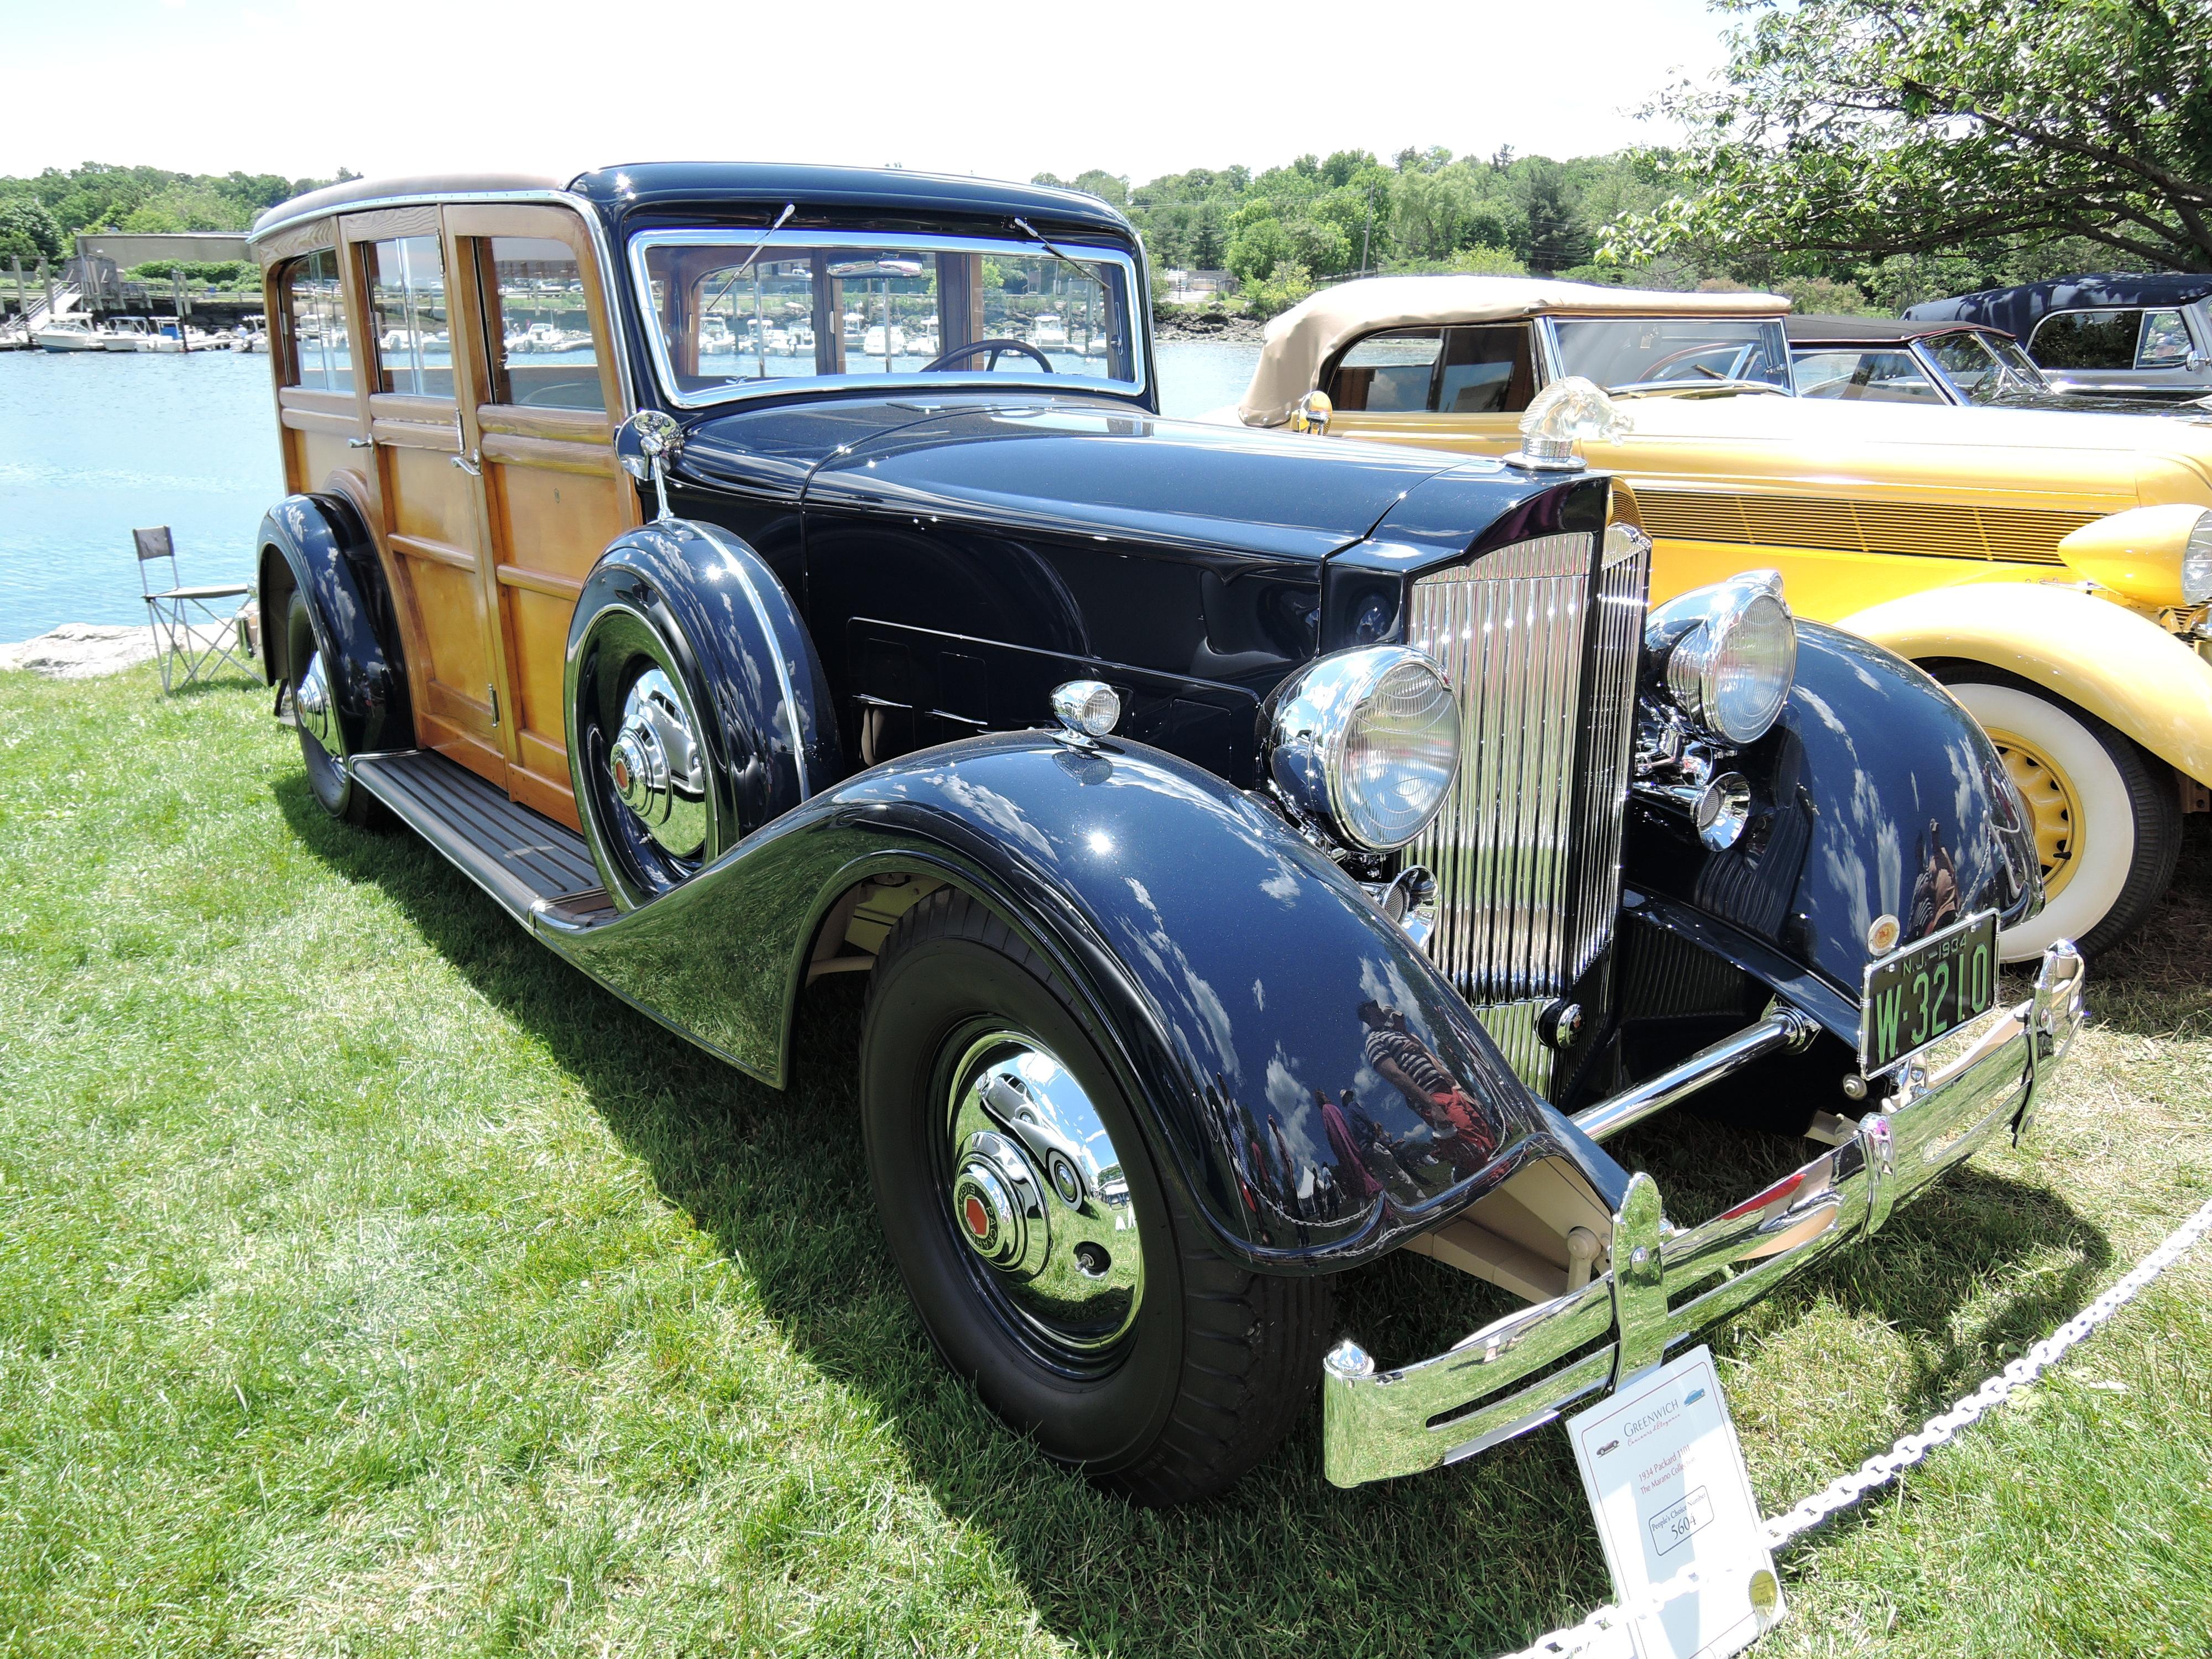 black/wood 1934 Packard 1101 Woody Wagon - Greenwich Concours d'Elegance 2017